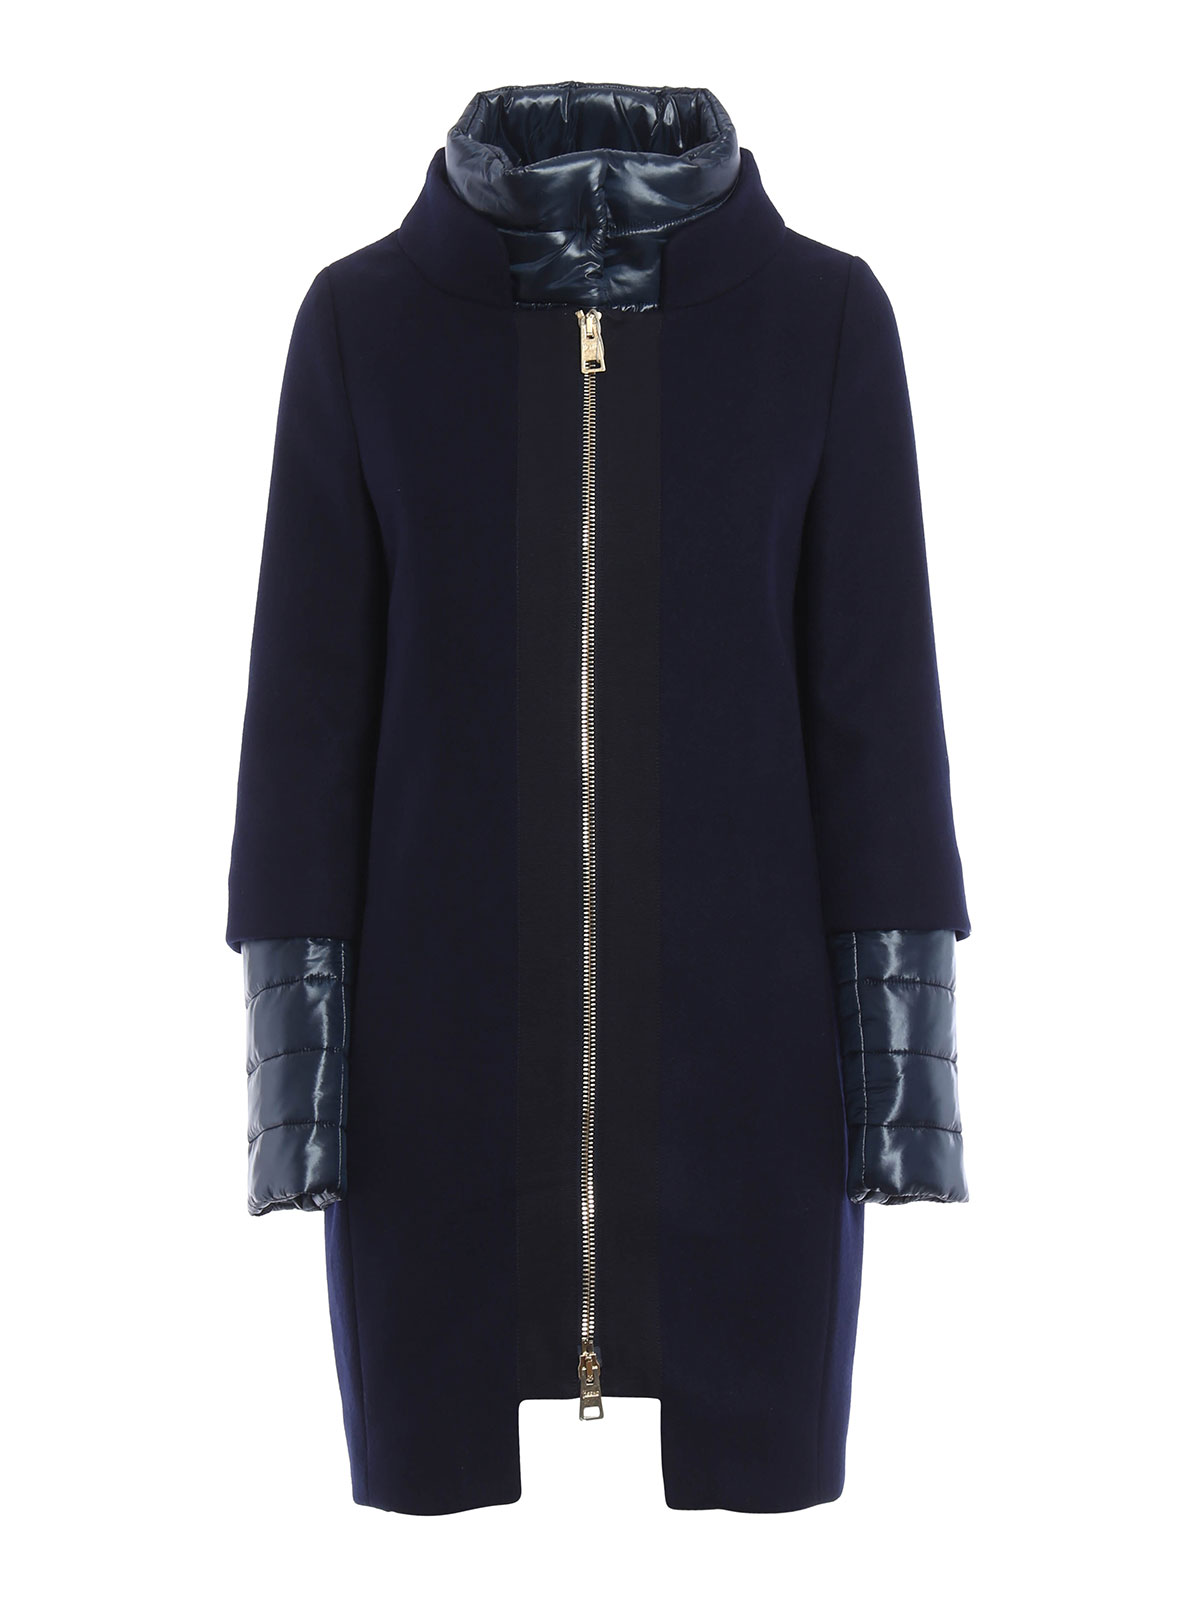 Herno Kurzer Mantel Fur Damen Blau Kurze Mäntel